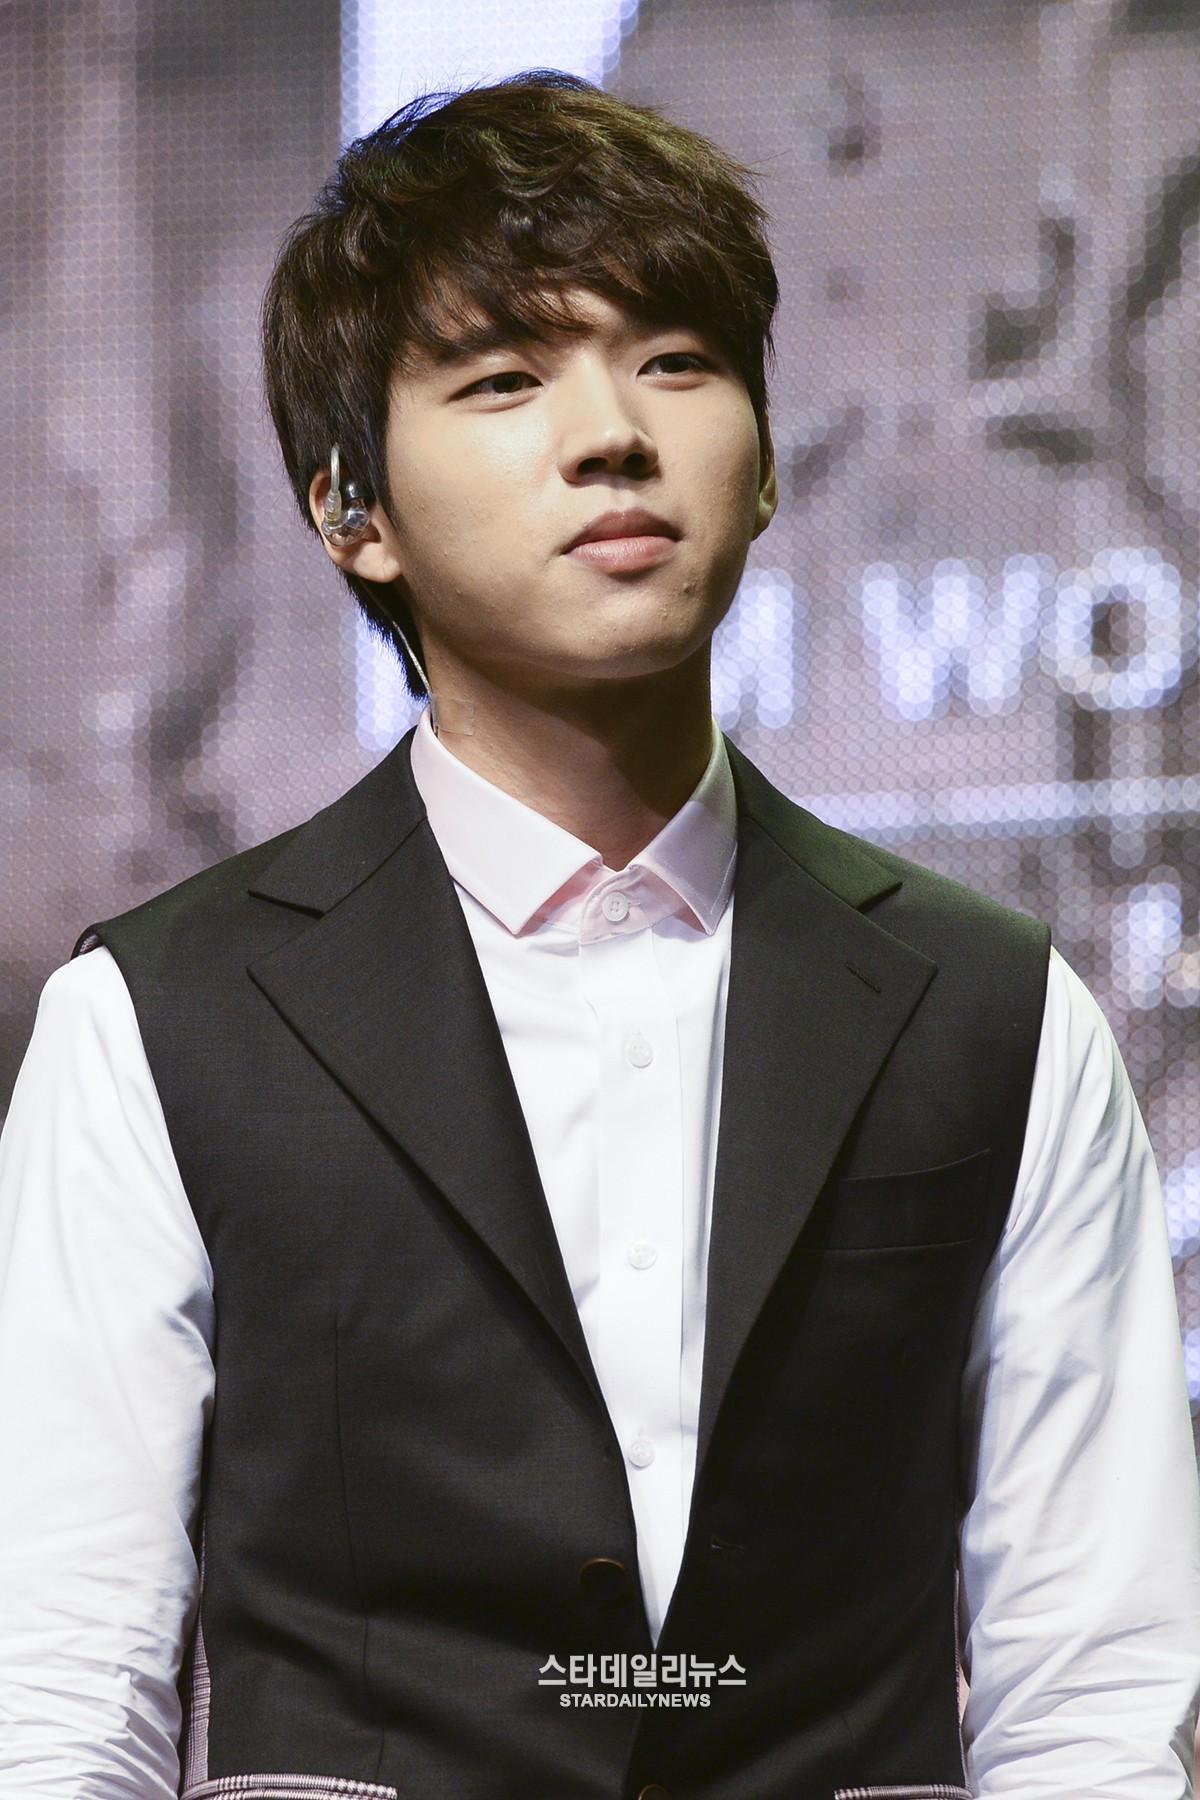 INFINITEs Woohyun Expresses Pride In His First Solo Mini Album